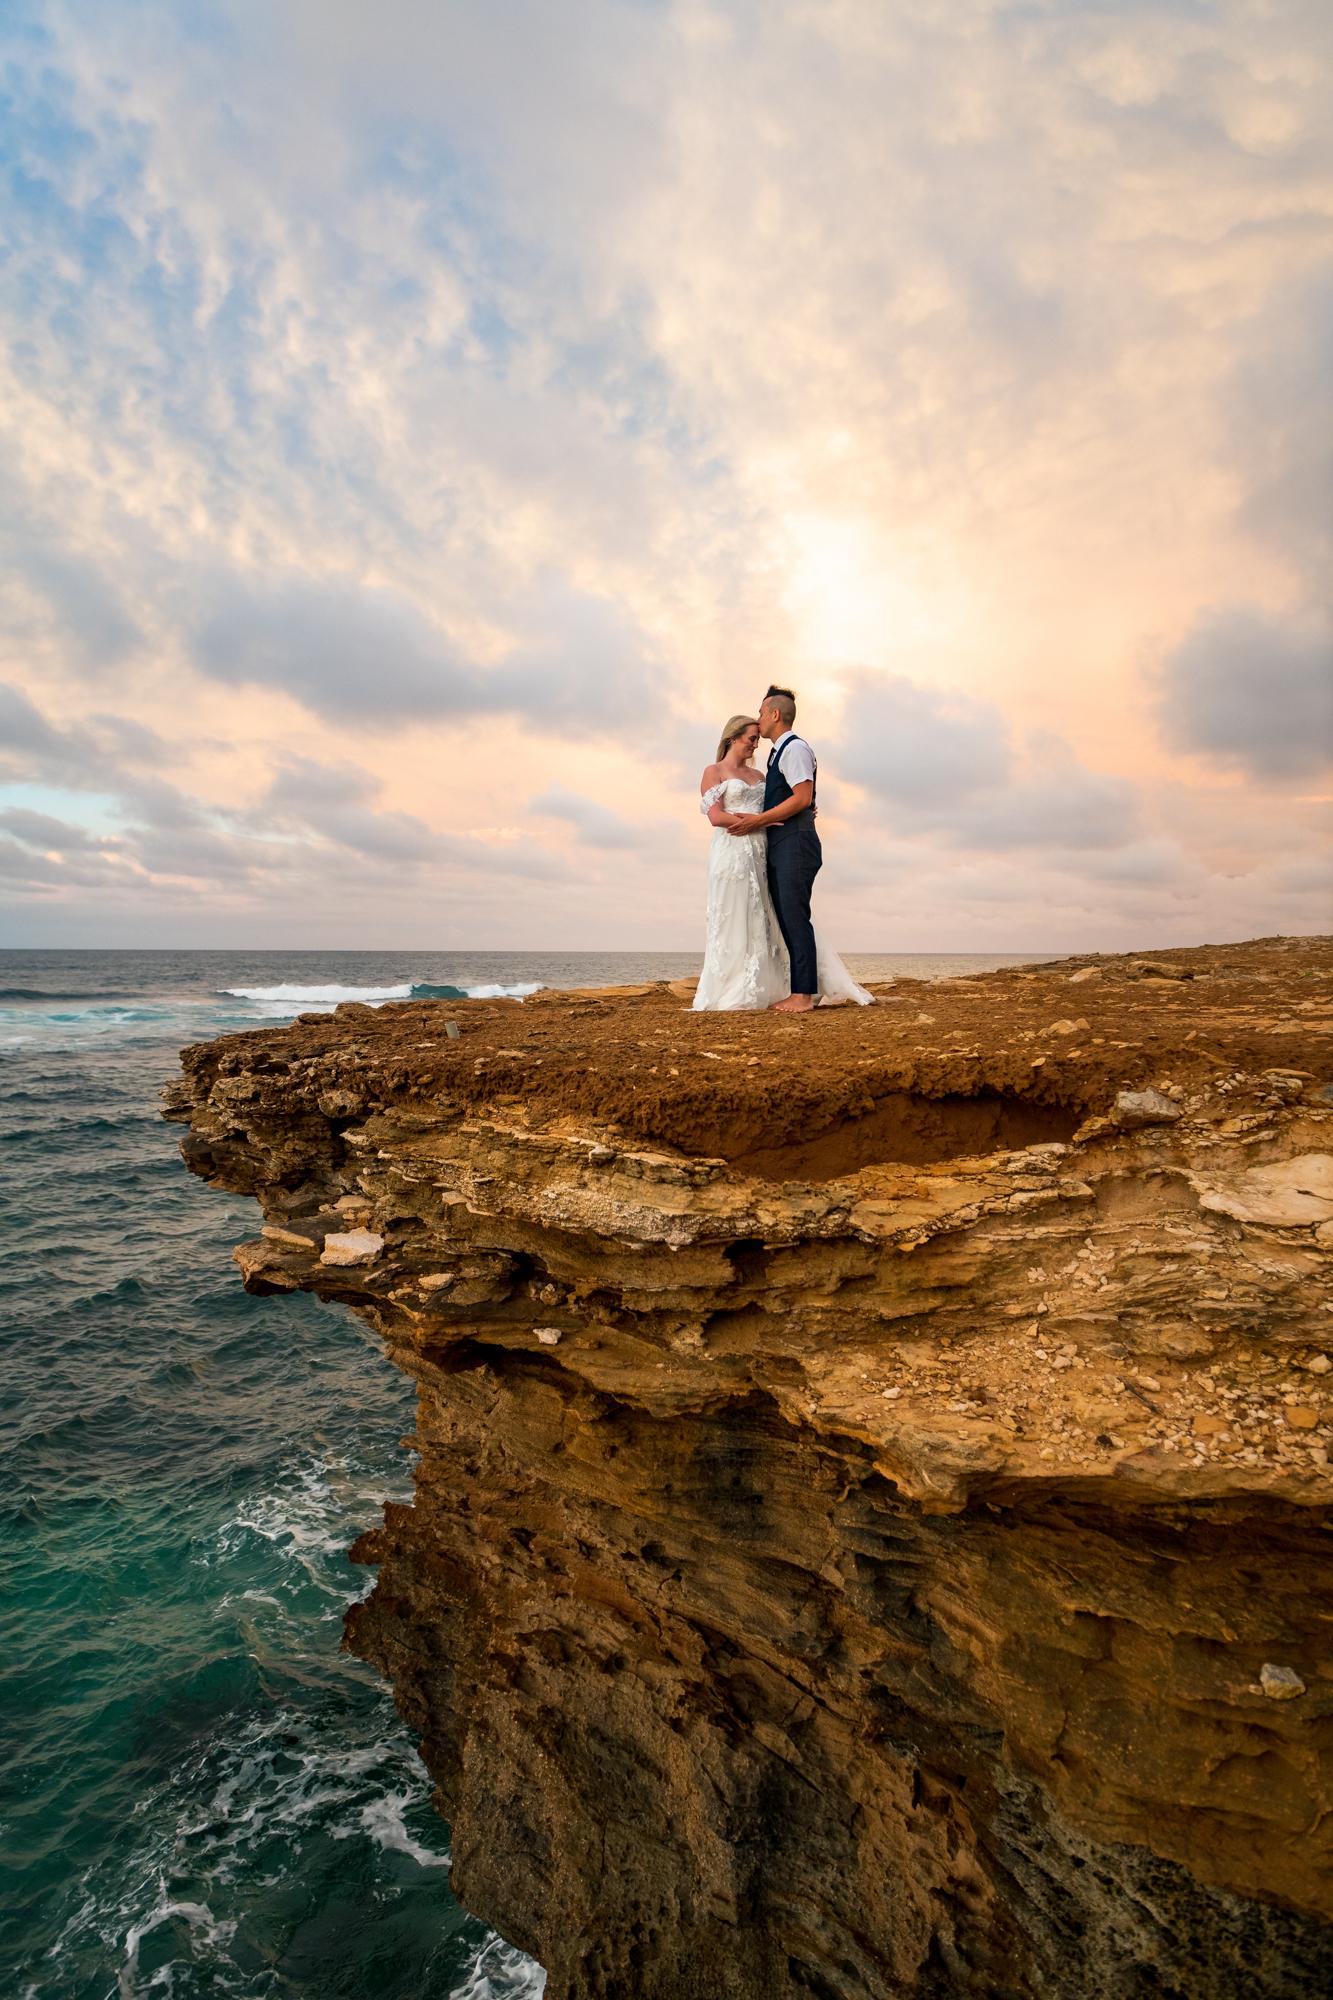 sunrise-wedding-coleen-shipwrecks-6-29-2919-9093.jpg